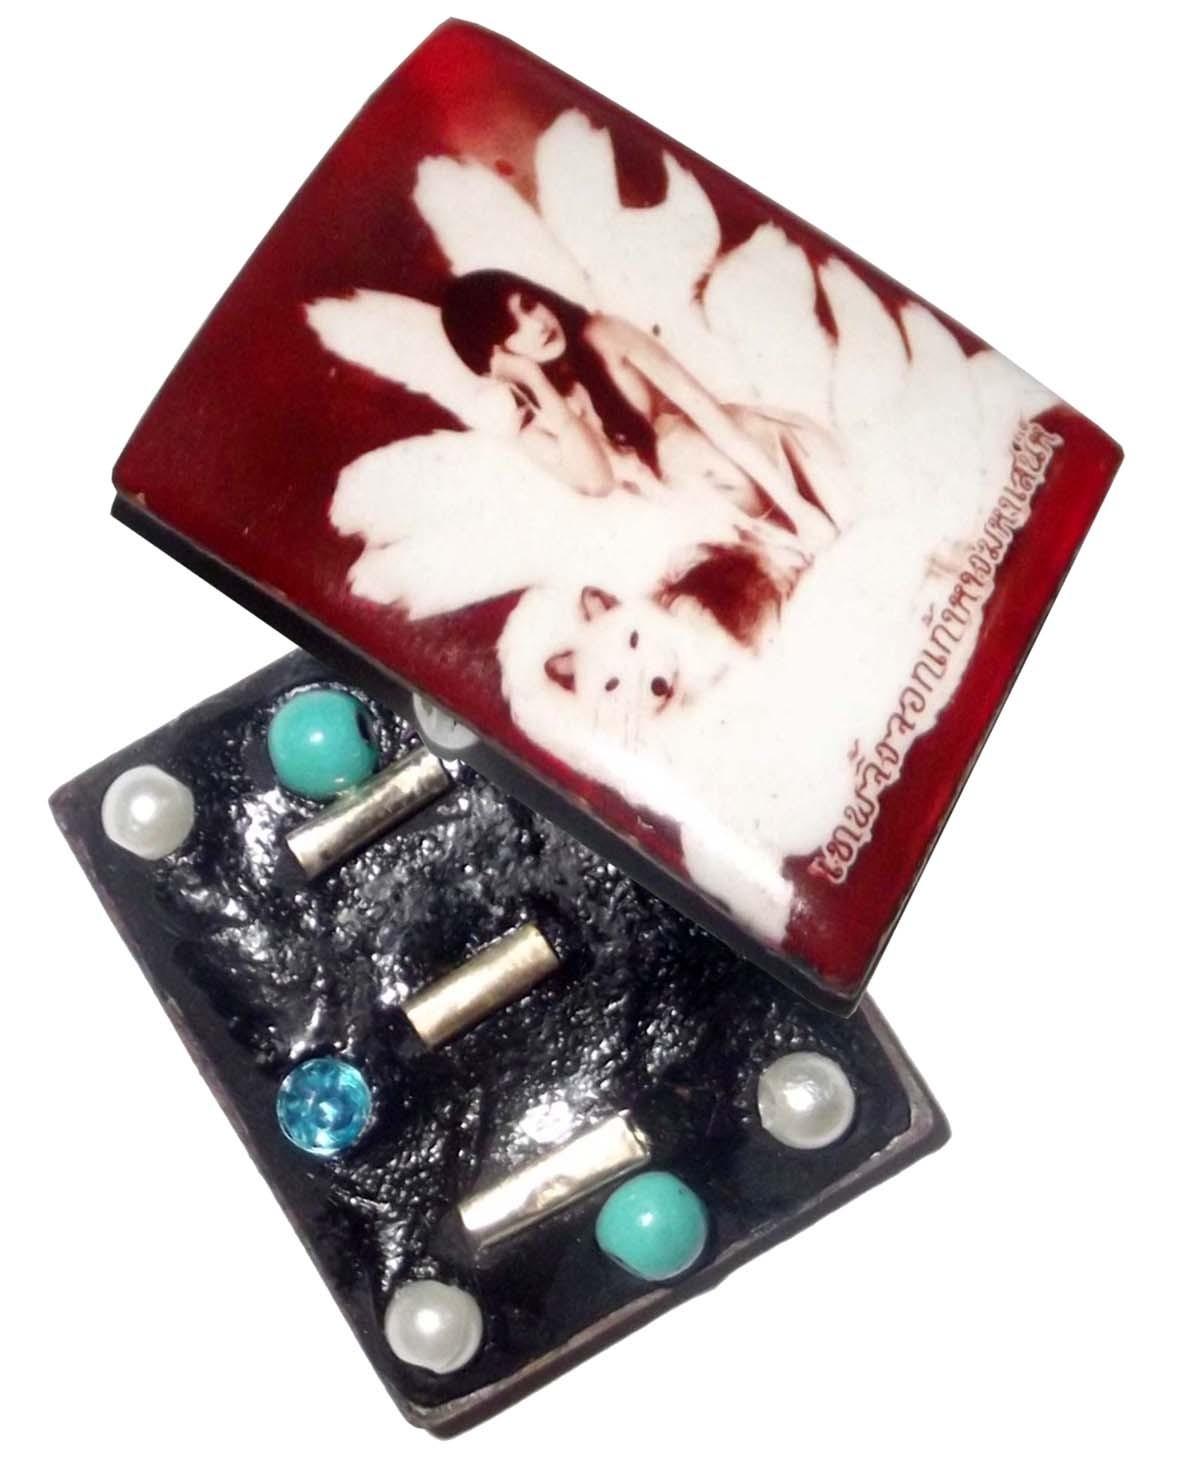 Locket Jing Jork Gao hang (9 Tails Fox) - Demoness Enchantress Locket (small size) - 2 Gems 3 Takrut 4 Pearls + 2 Ploi Sek - Por Phu Noi Dtan (Lanna Laymaster)